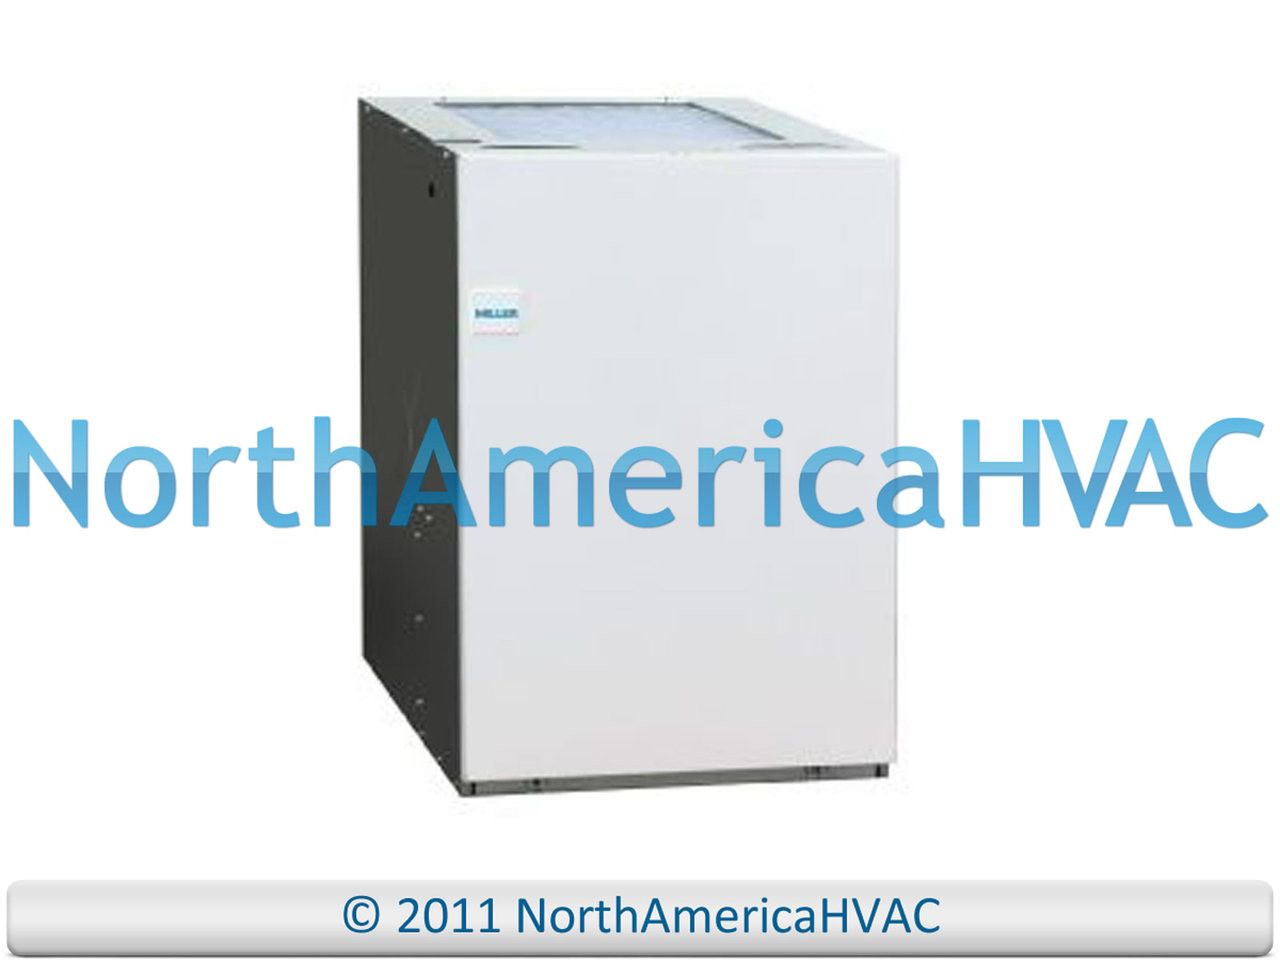 mobile home intertherm furnace wiring diagram e2eb 020 ha wiring diagram centre [ 1280 x 960 Pixel ]